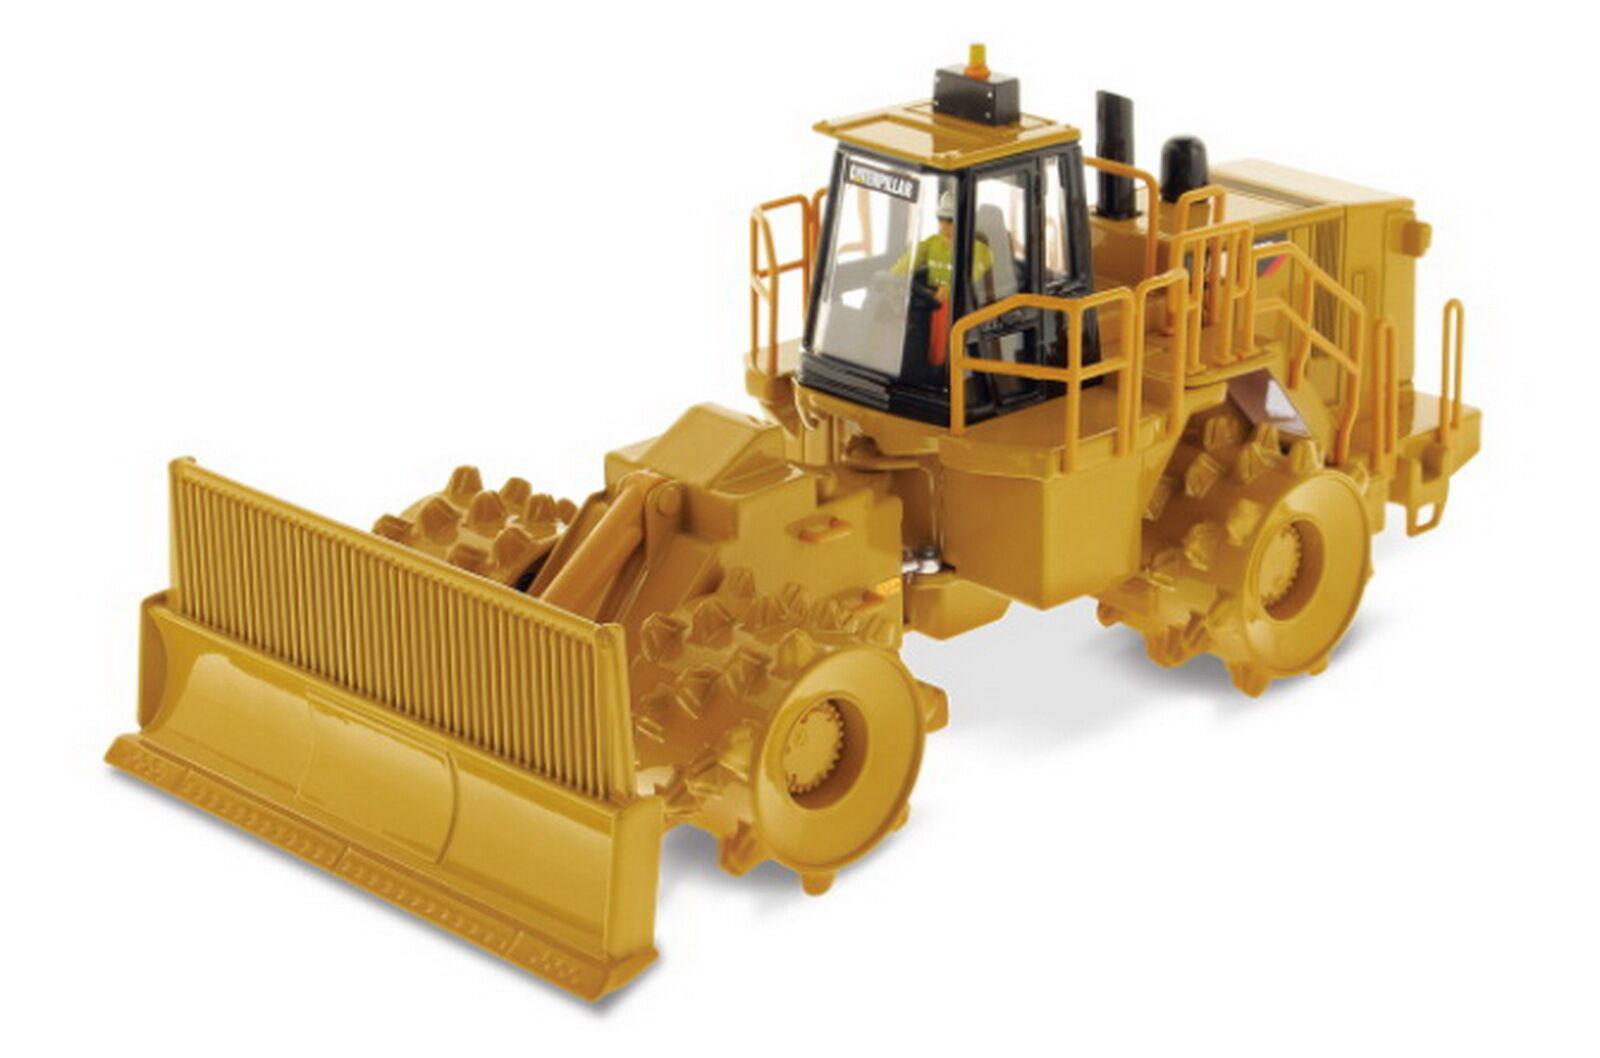 1 50 DM Caterpillar Cat 836H Landfill Compactor Diecast Model